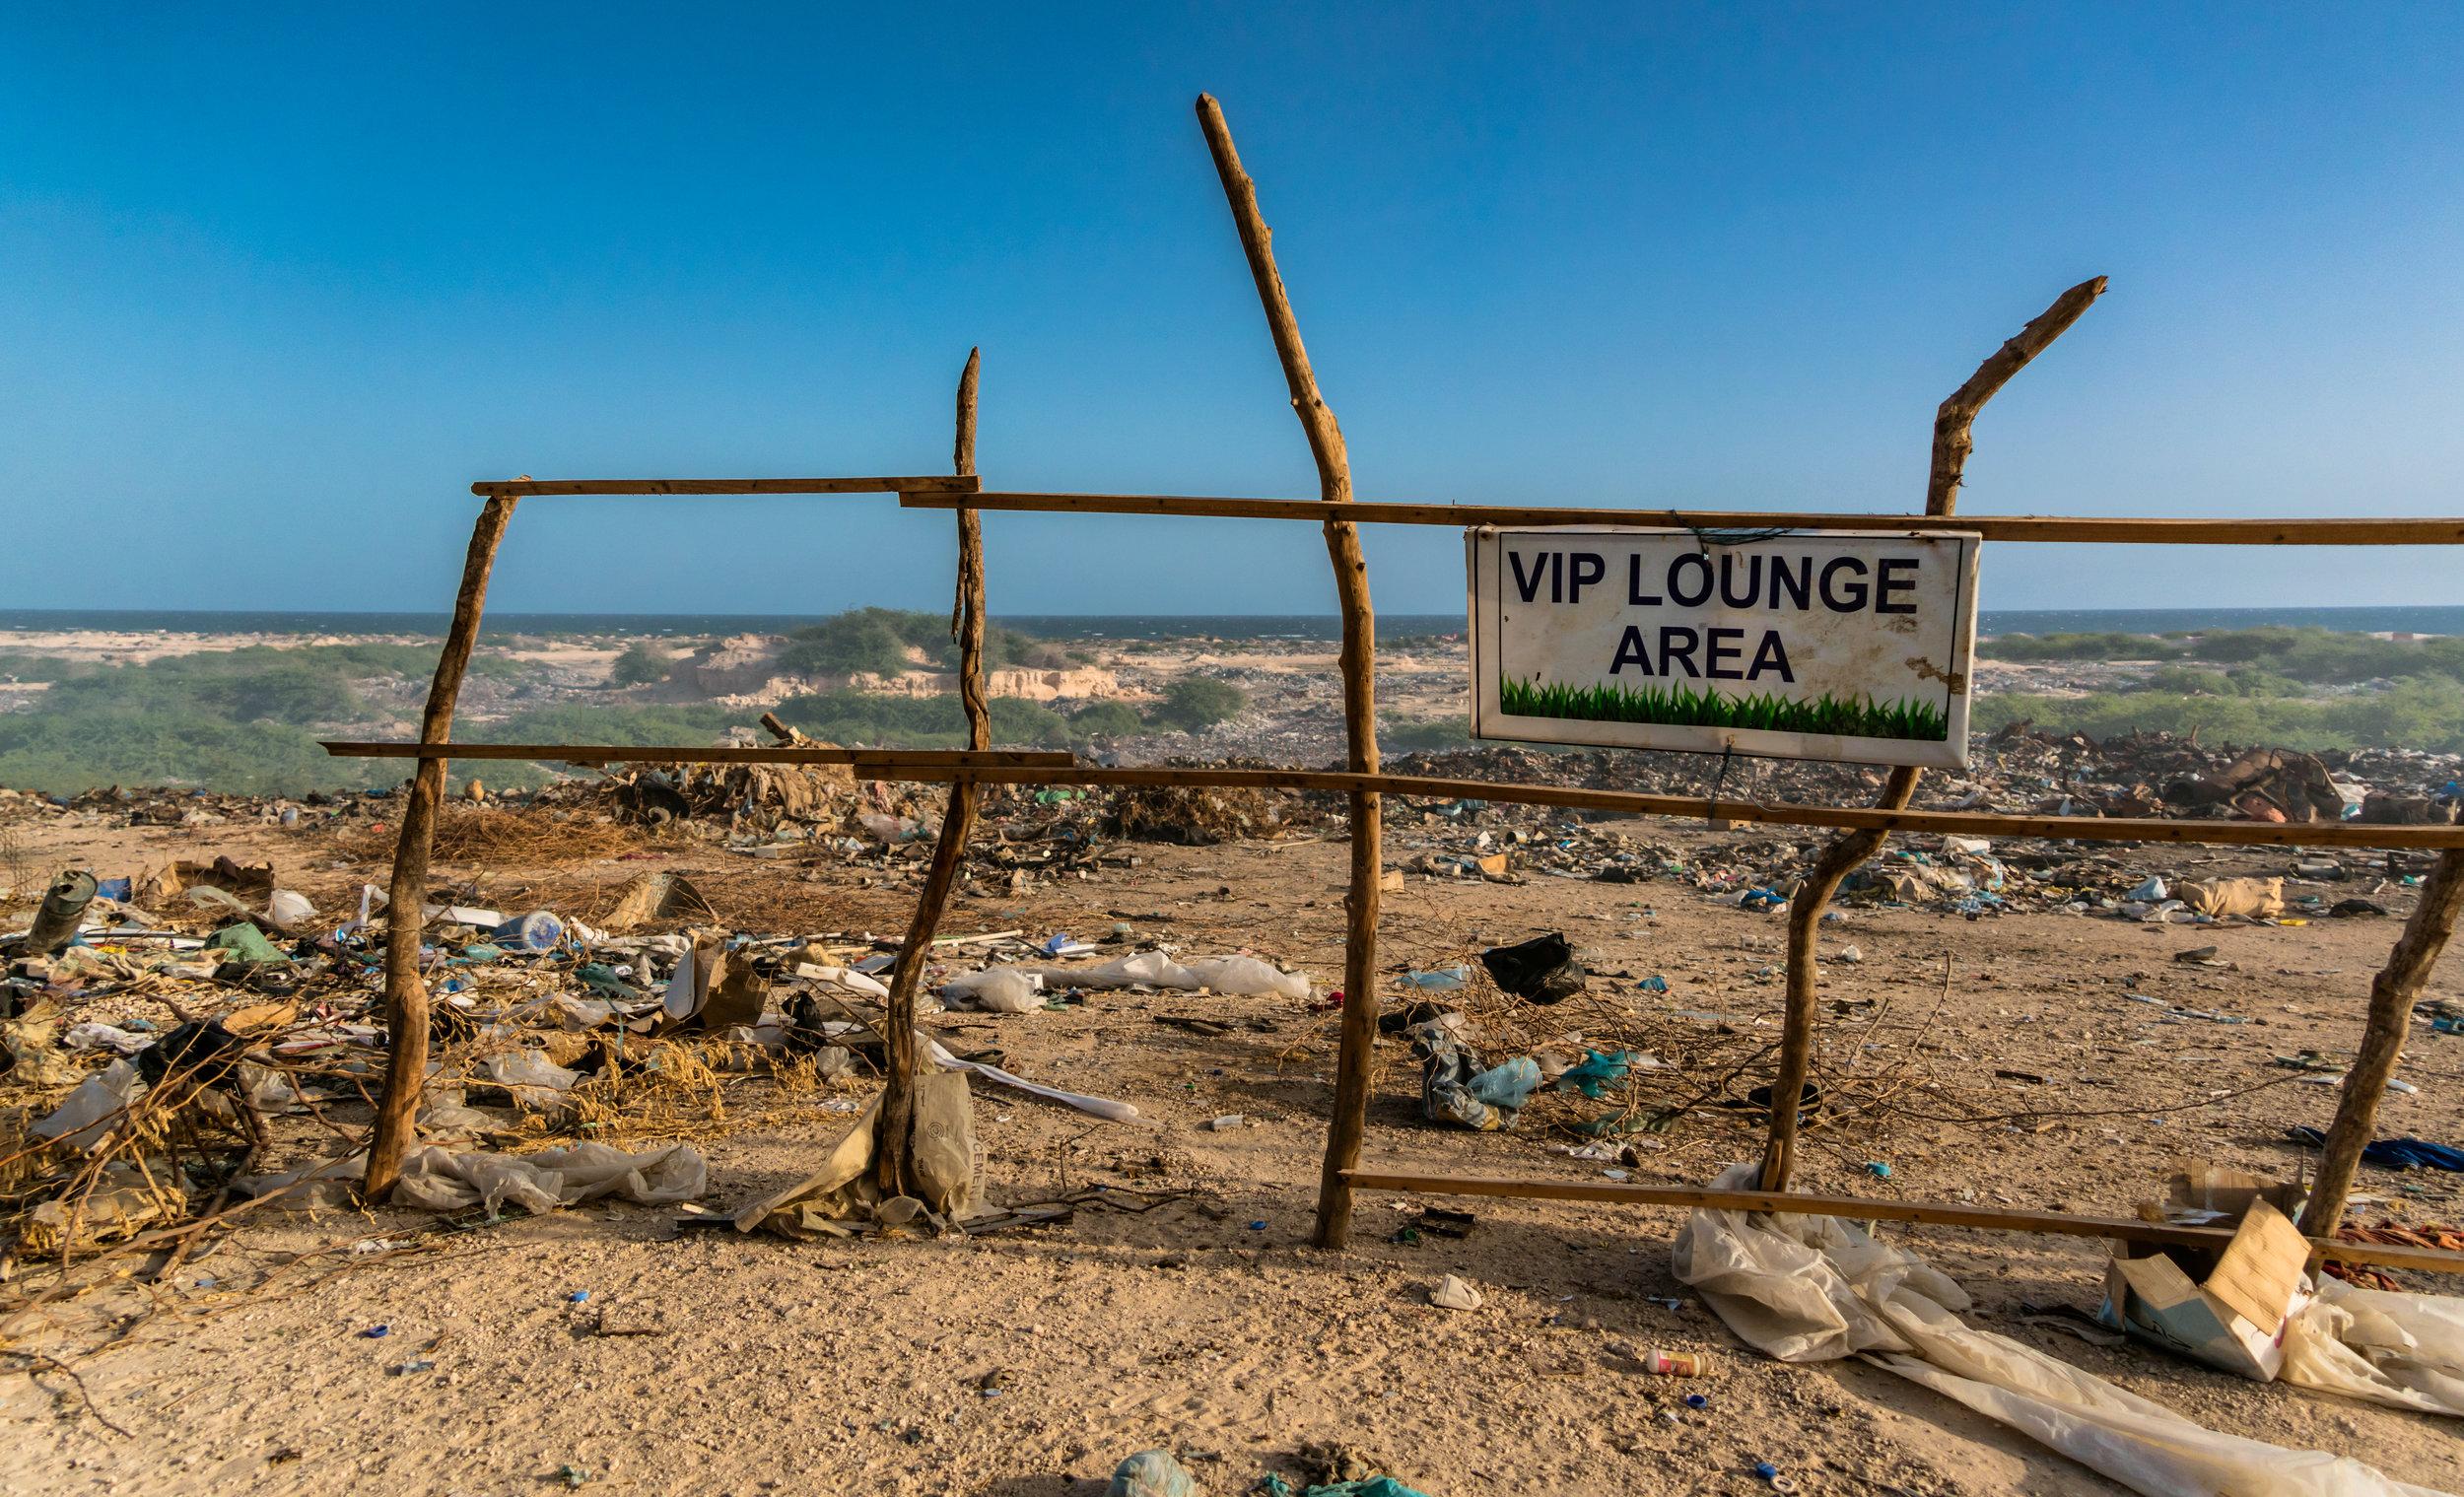 VIP Lounge Area